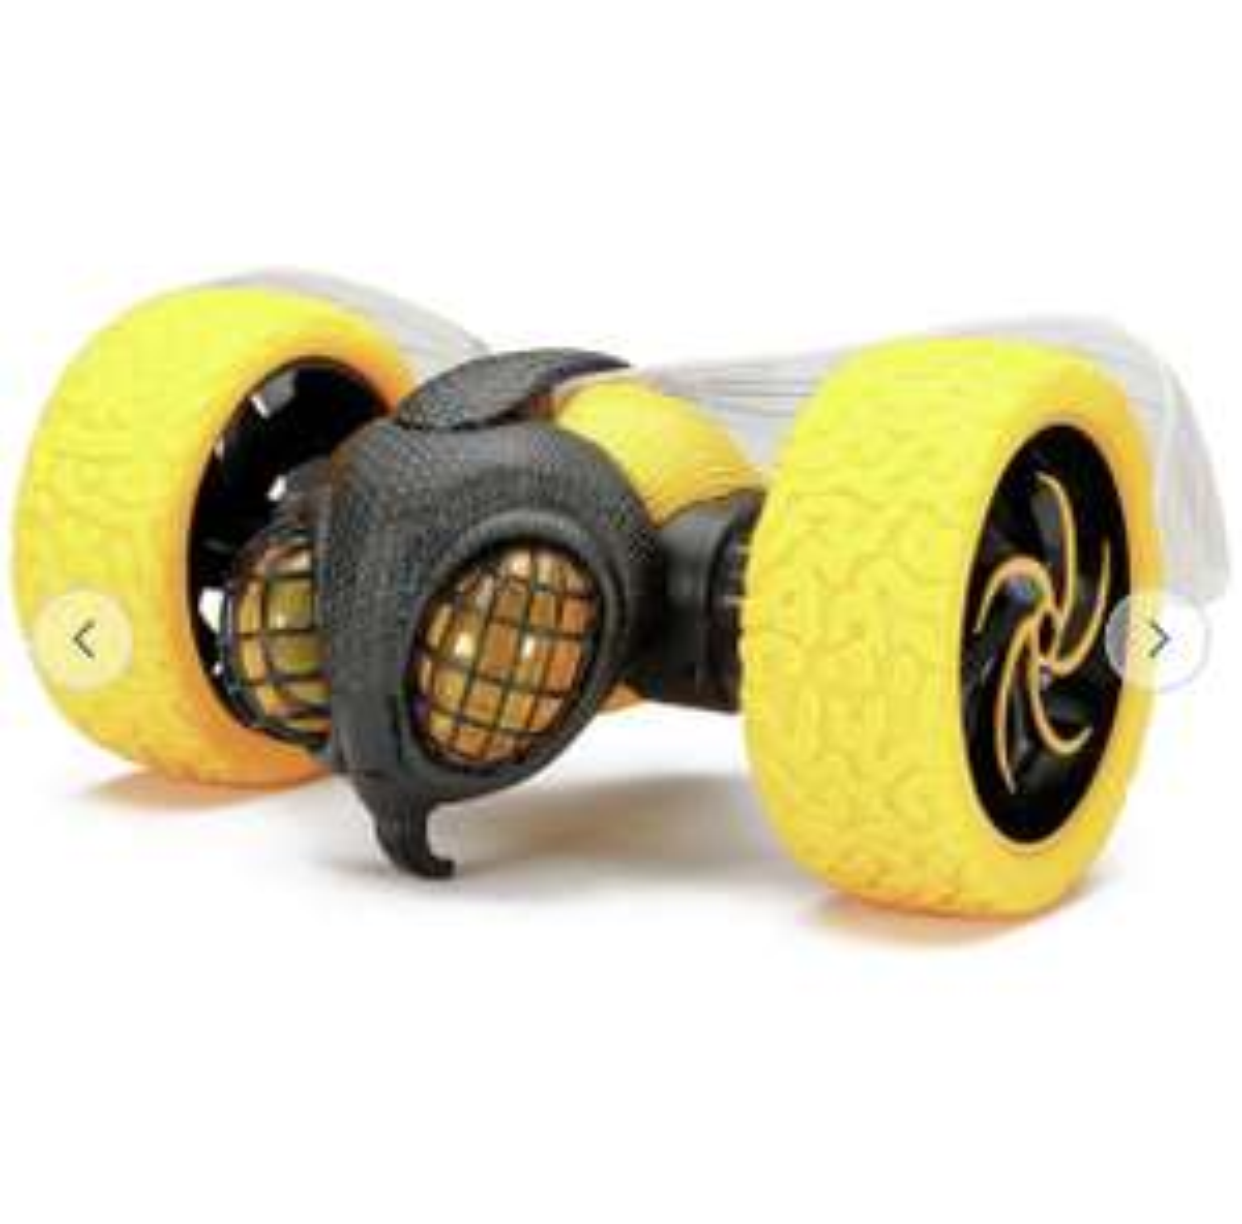 New Bright Radio Controlled Tumble Bee 10 Inch - Yellow @ Argos